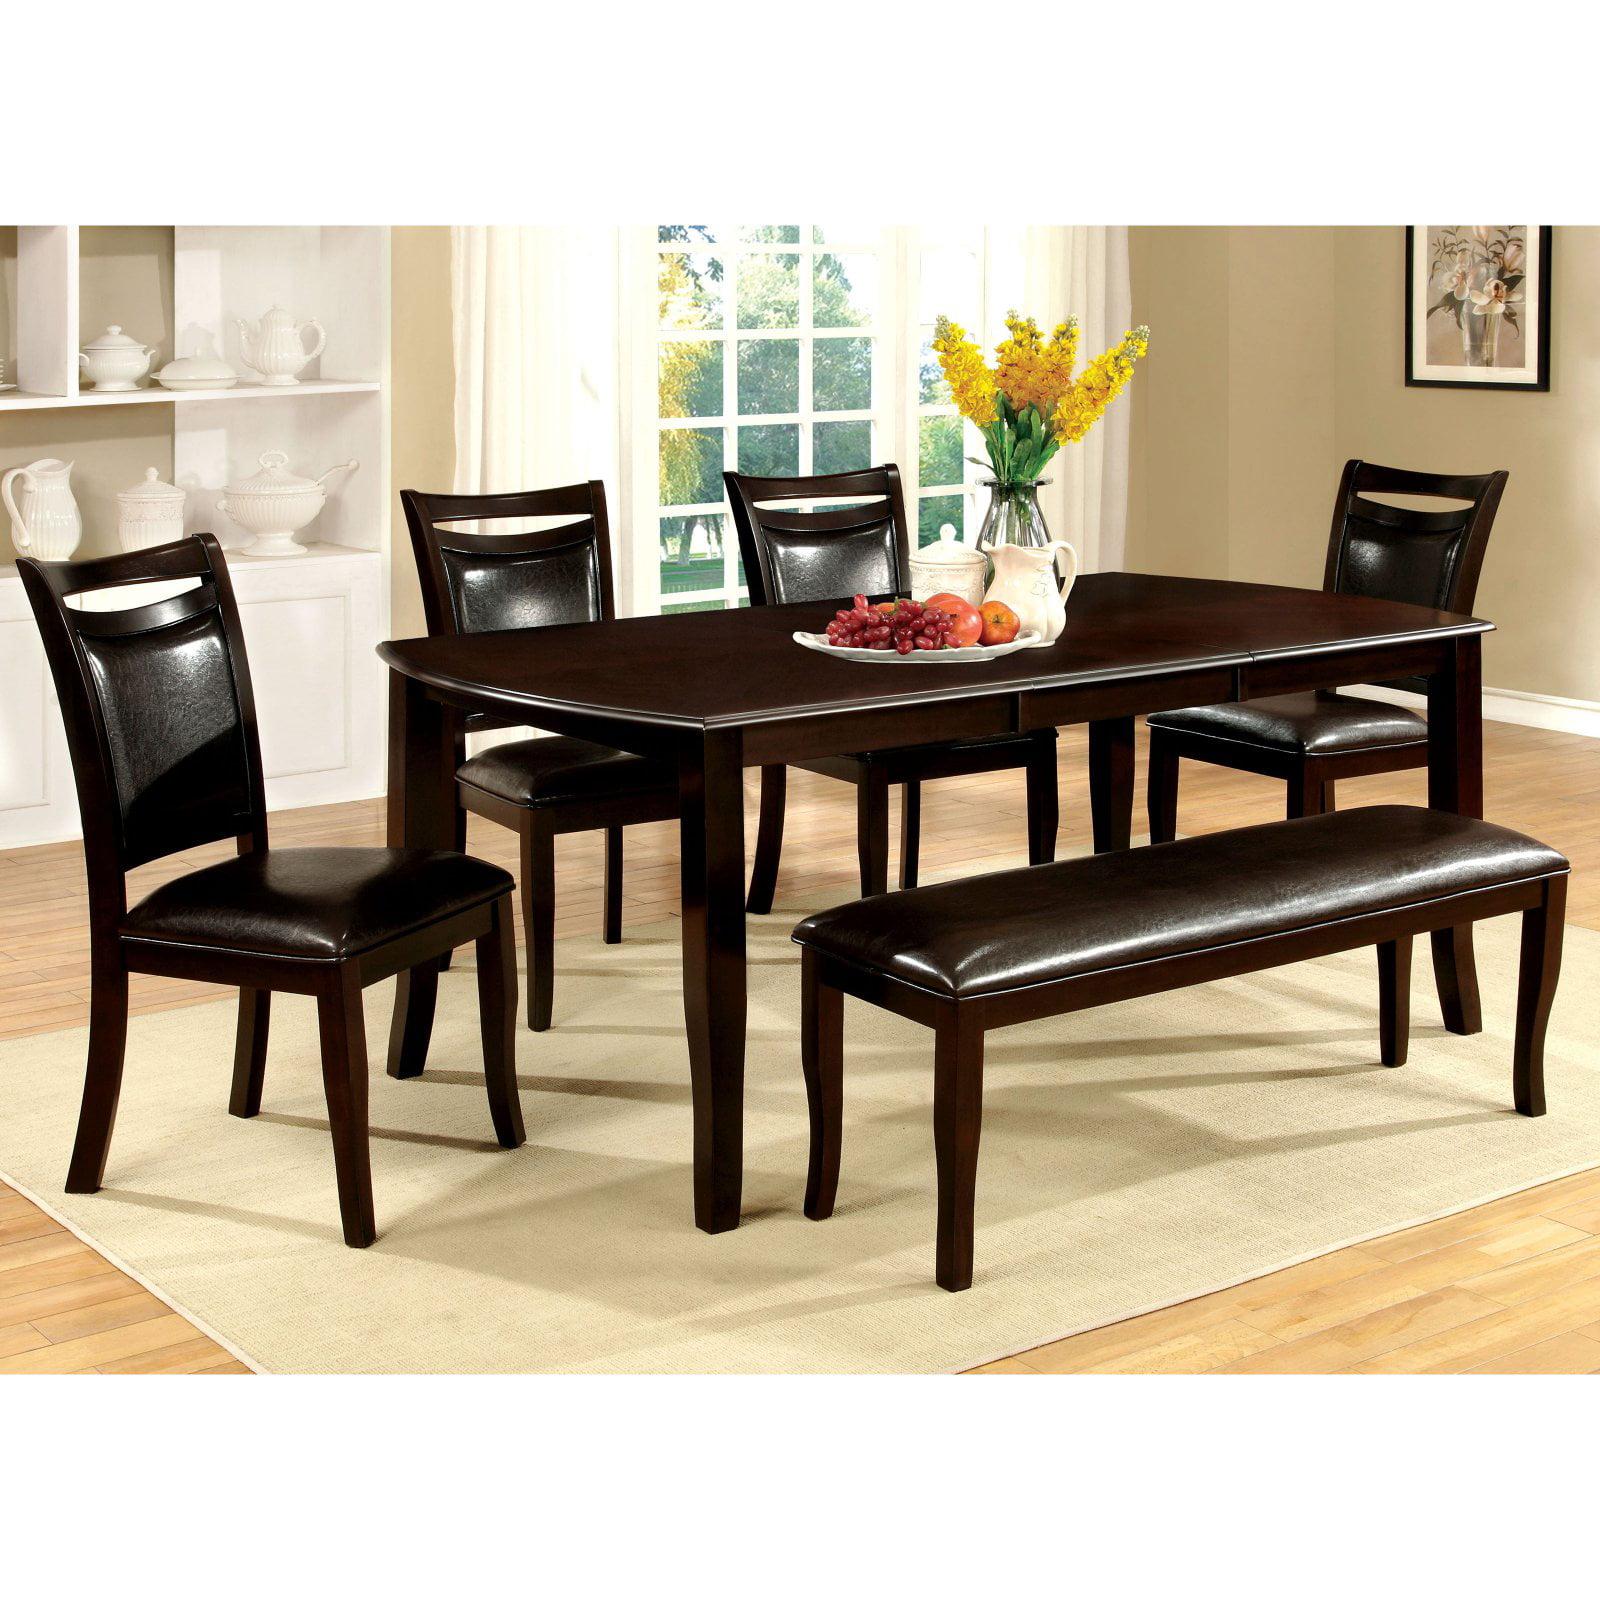 Furniture of America Ridgeway 6 Piece Dining Table Set